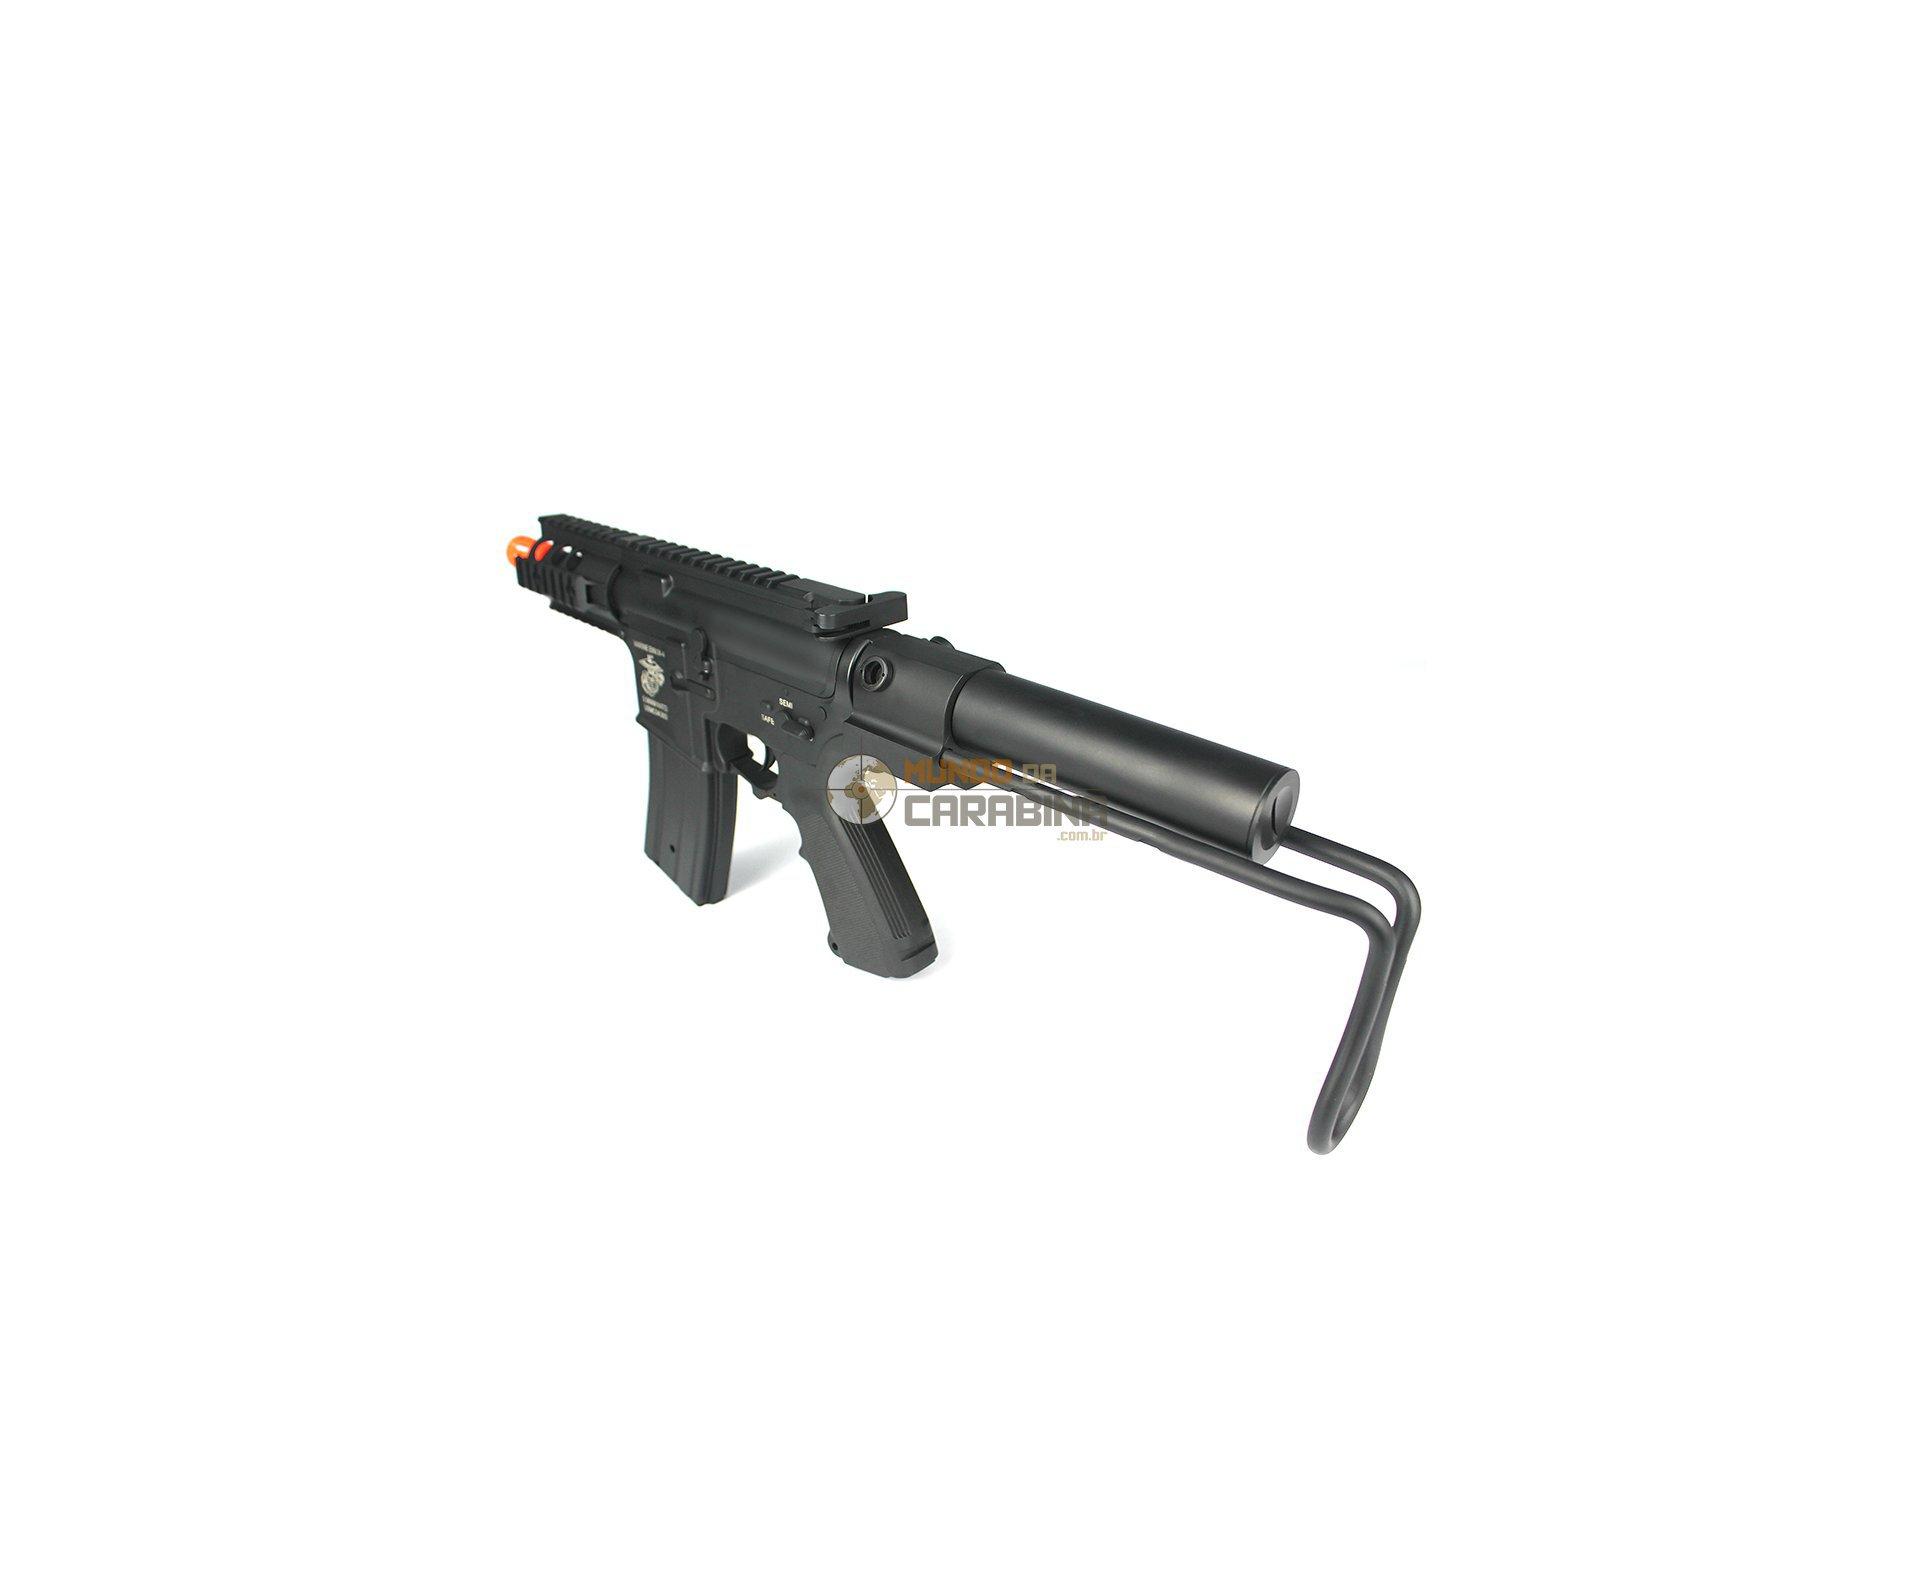 Sub-metralhadora De Airsoft M4 Baby Com Coronha M241 - Full Metal - S&t